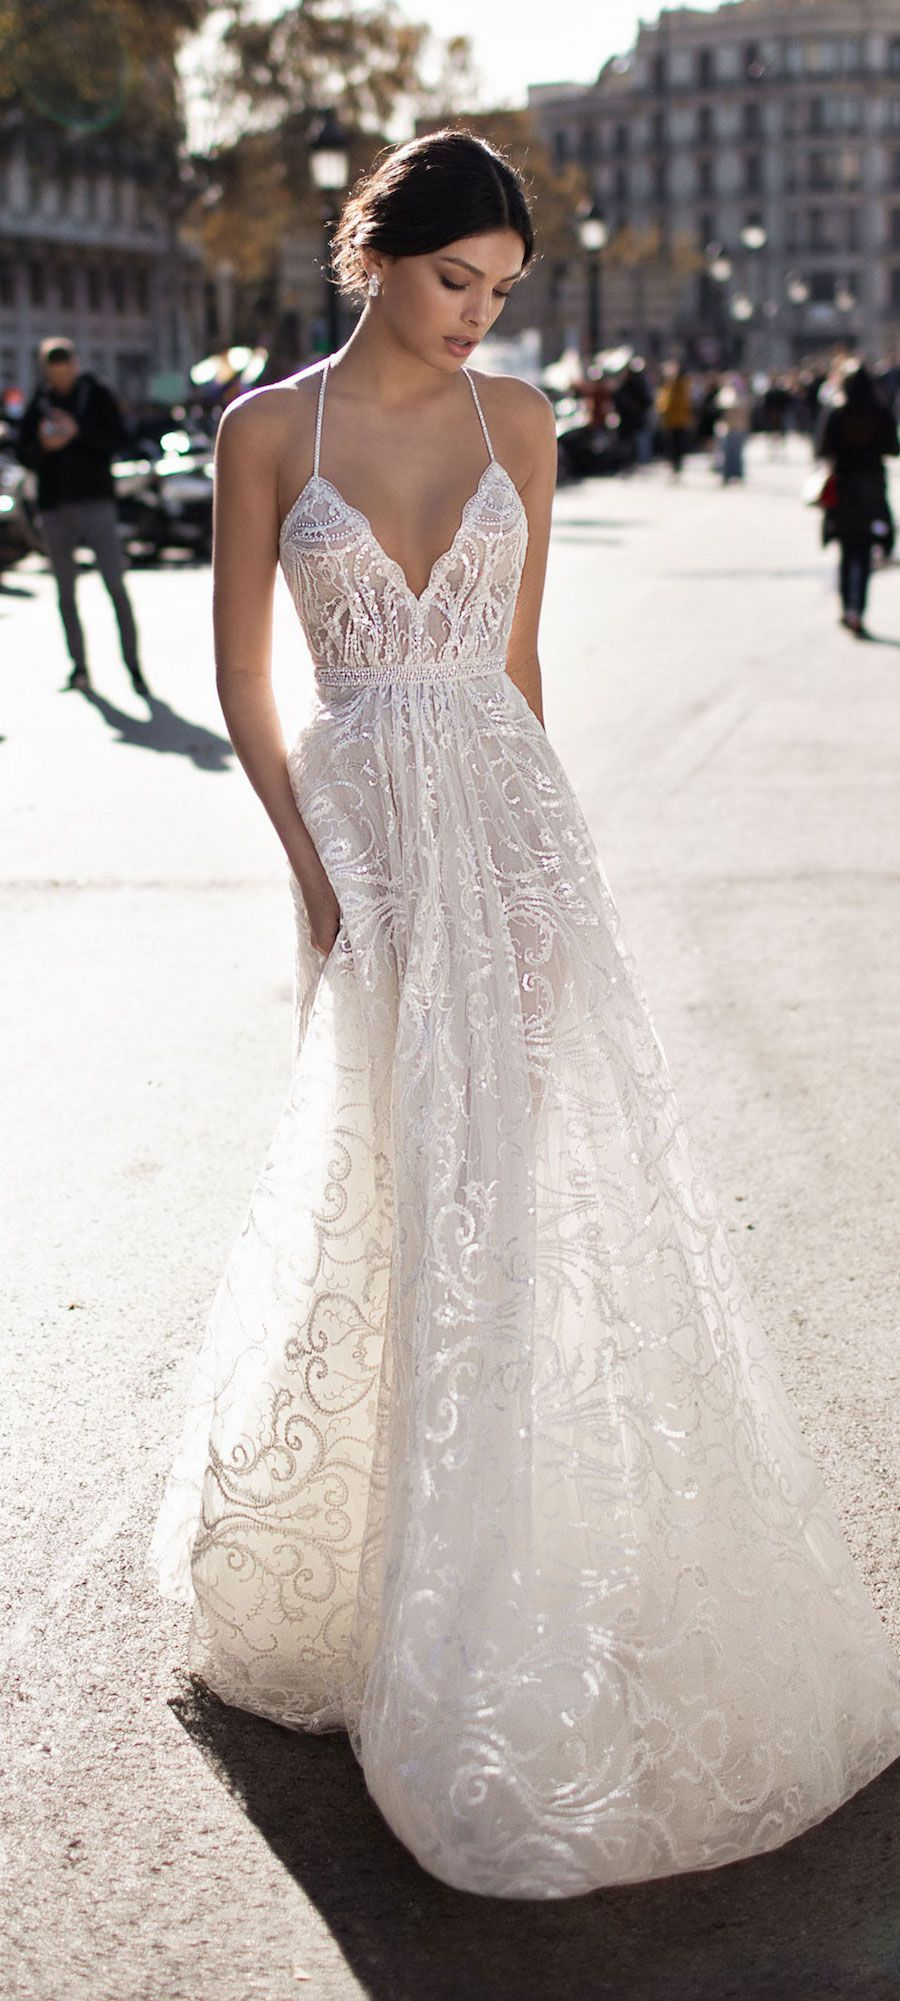 Halter style wedding dresses  Gali Karten Bridal  Wedding Dress  Boda  Pinterest  Wedding